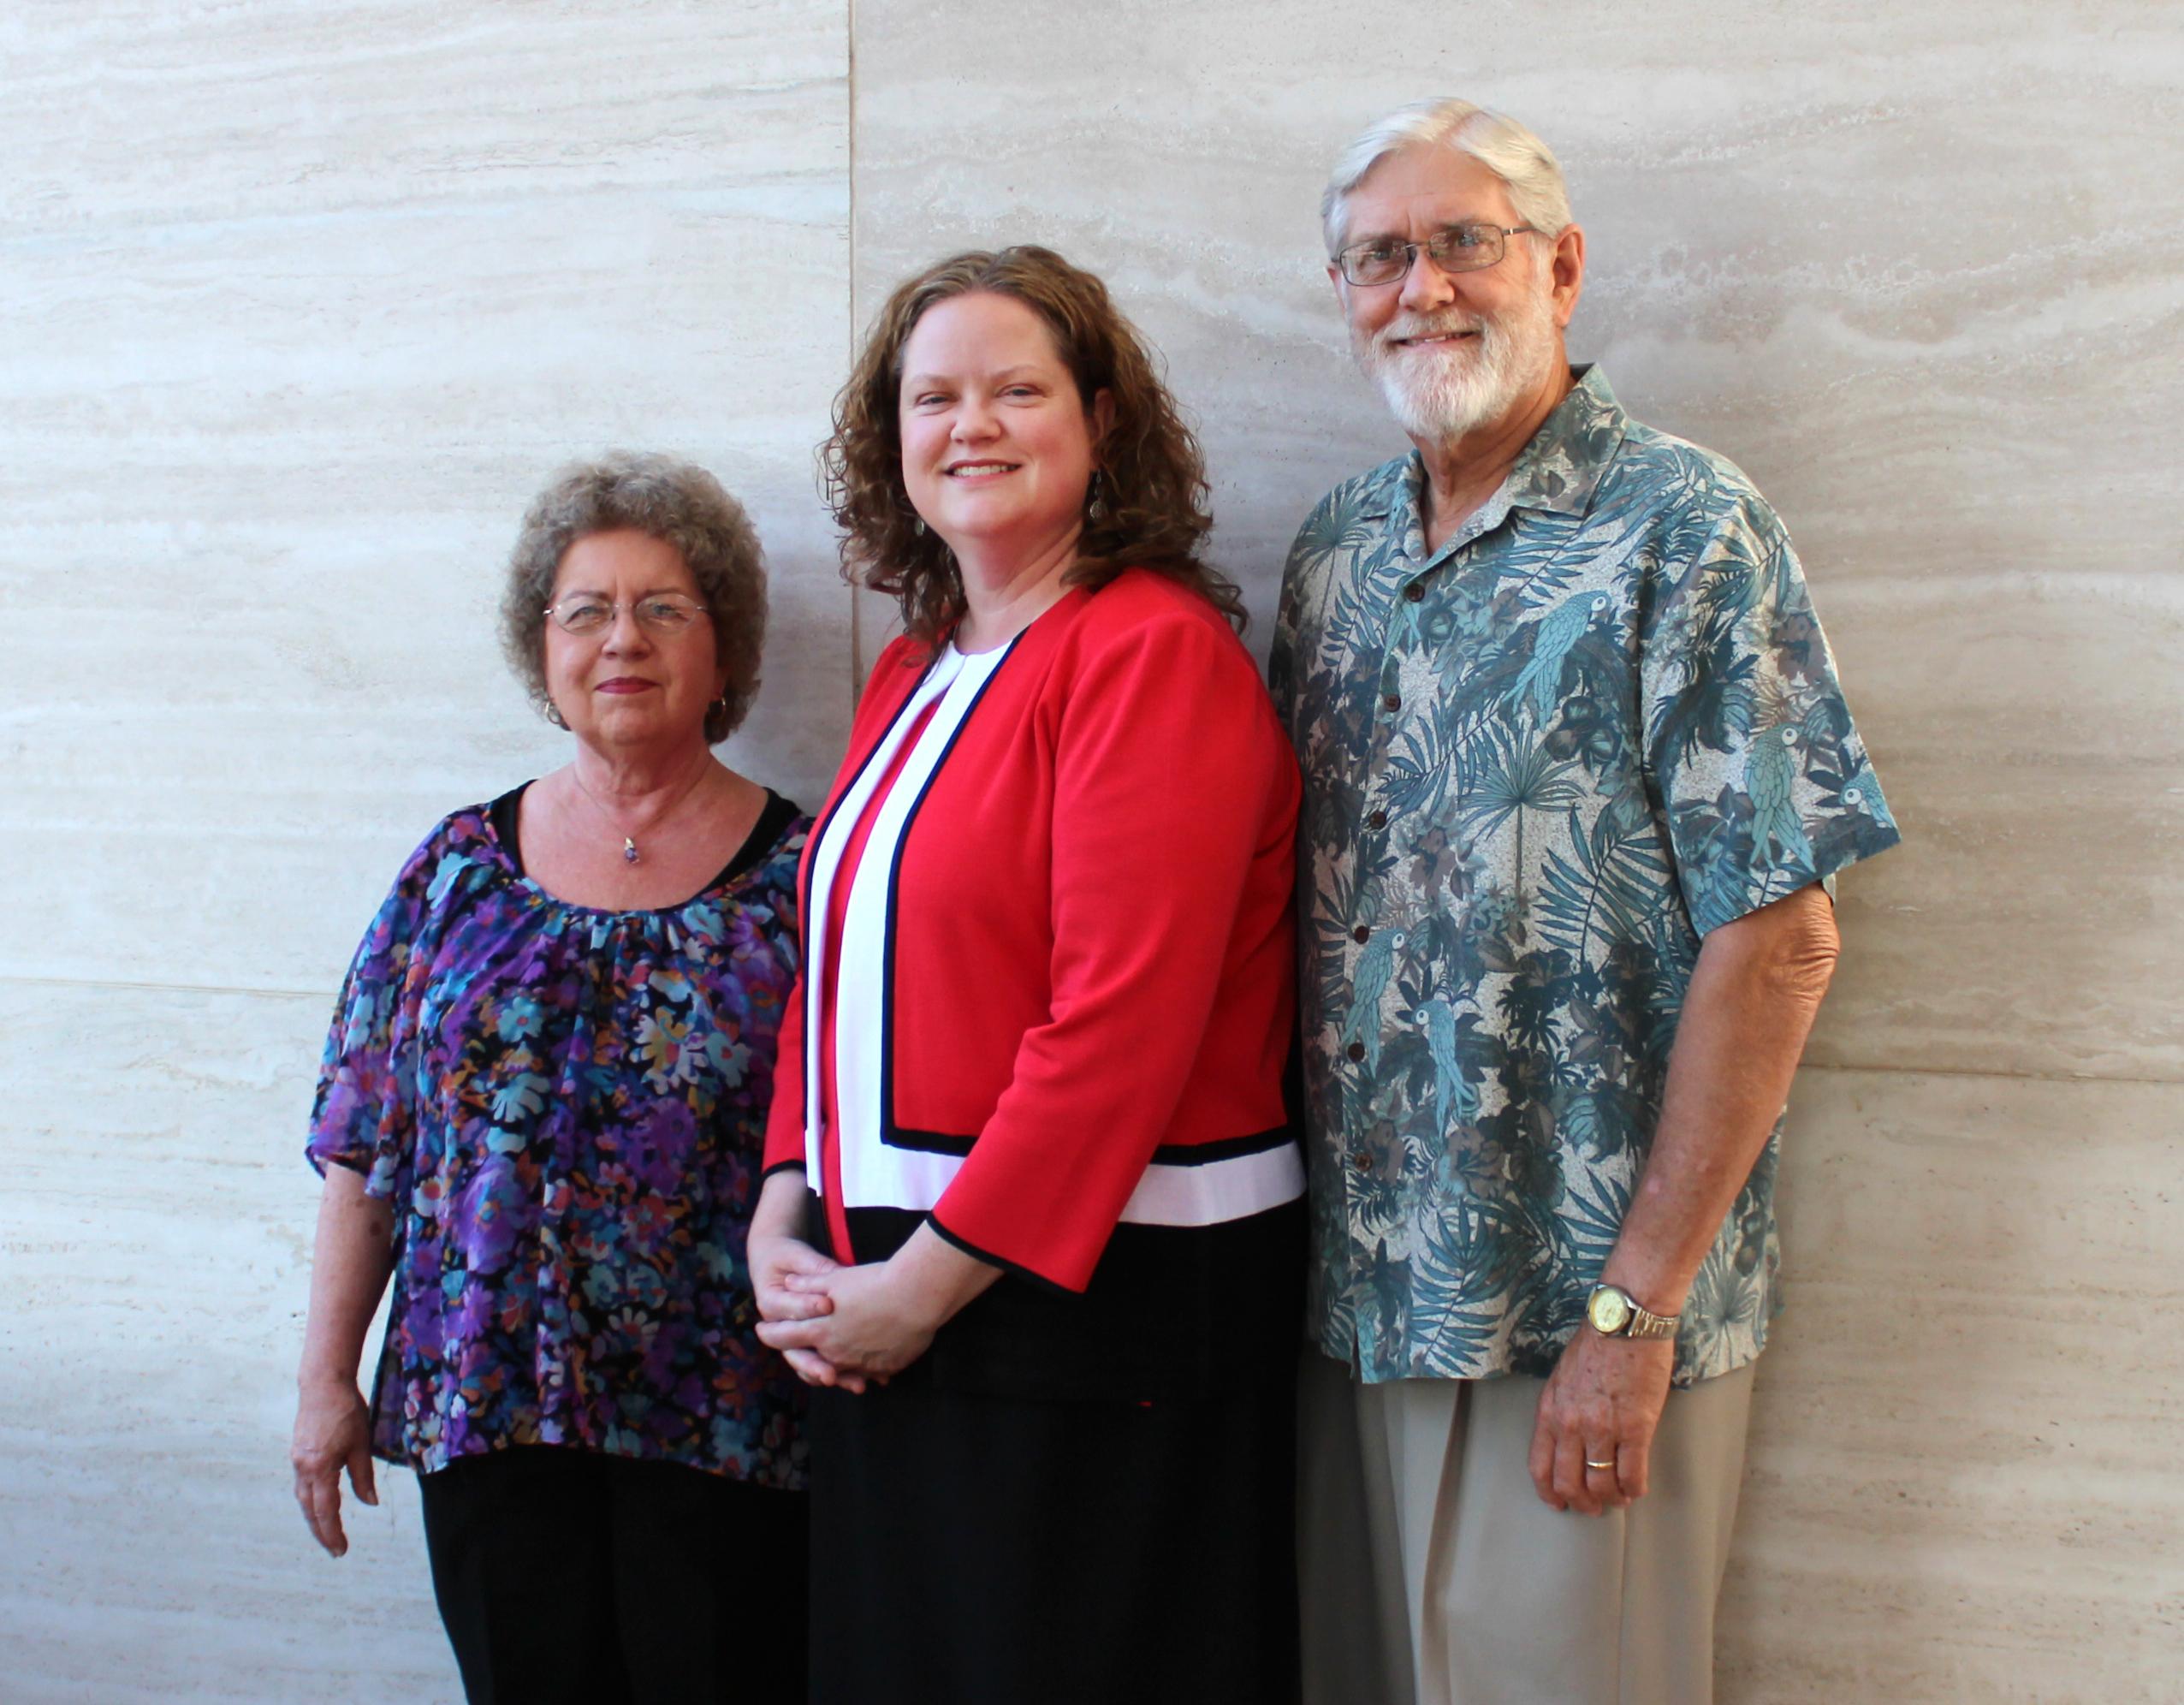 Dr. Brockman and family